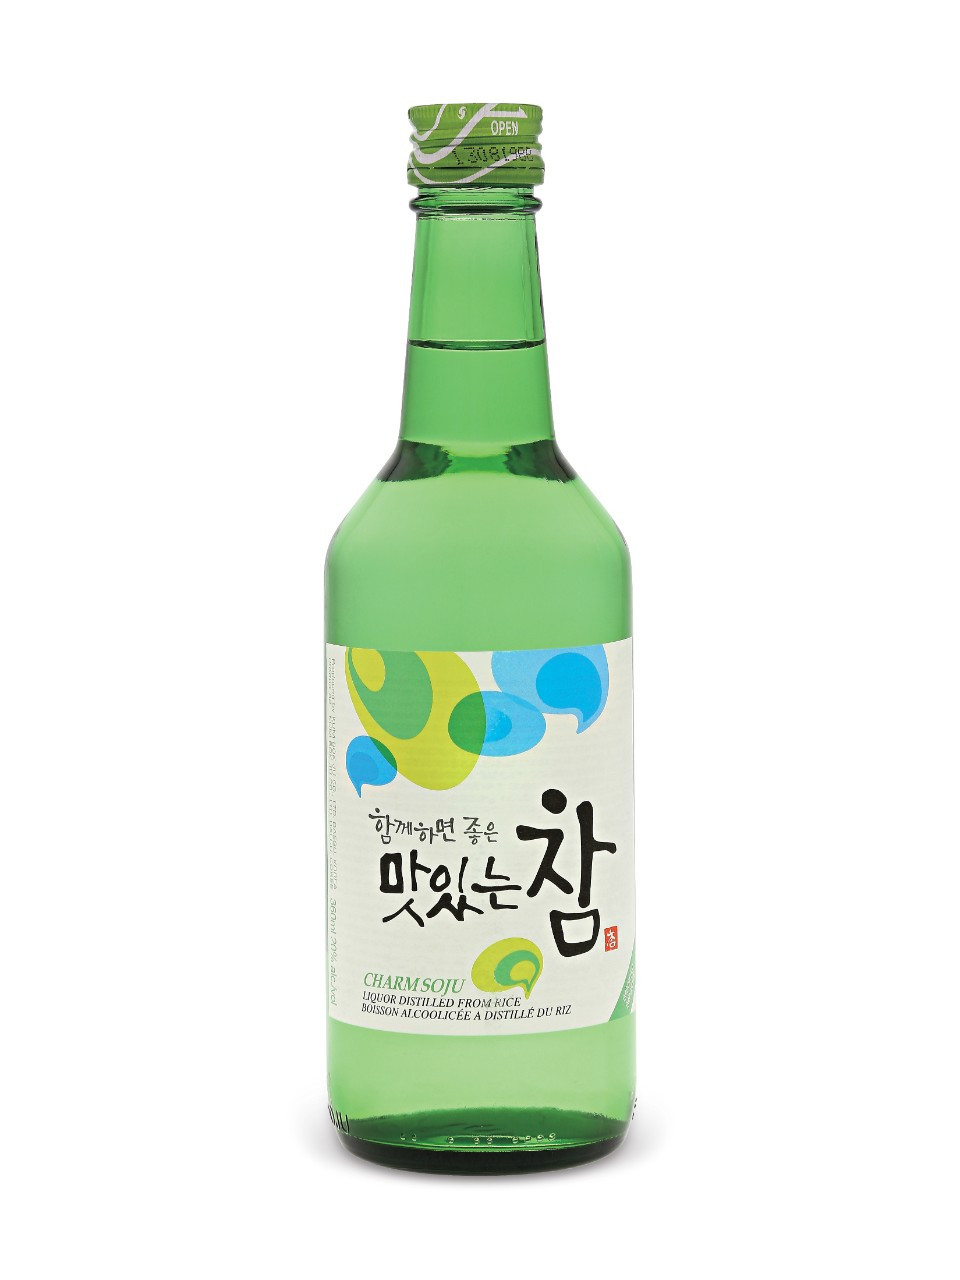 Charm soju liquor  360 ml